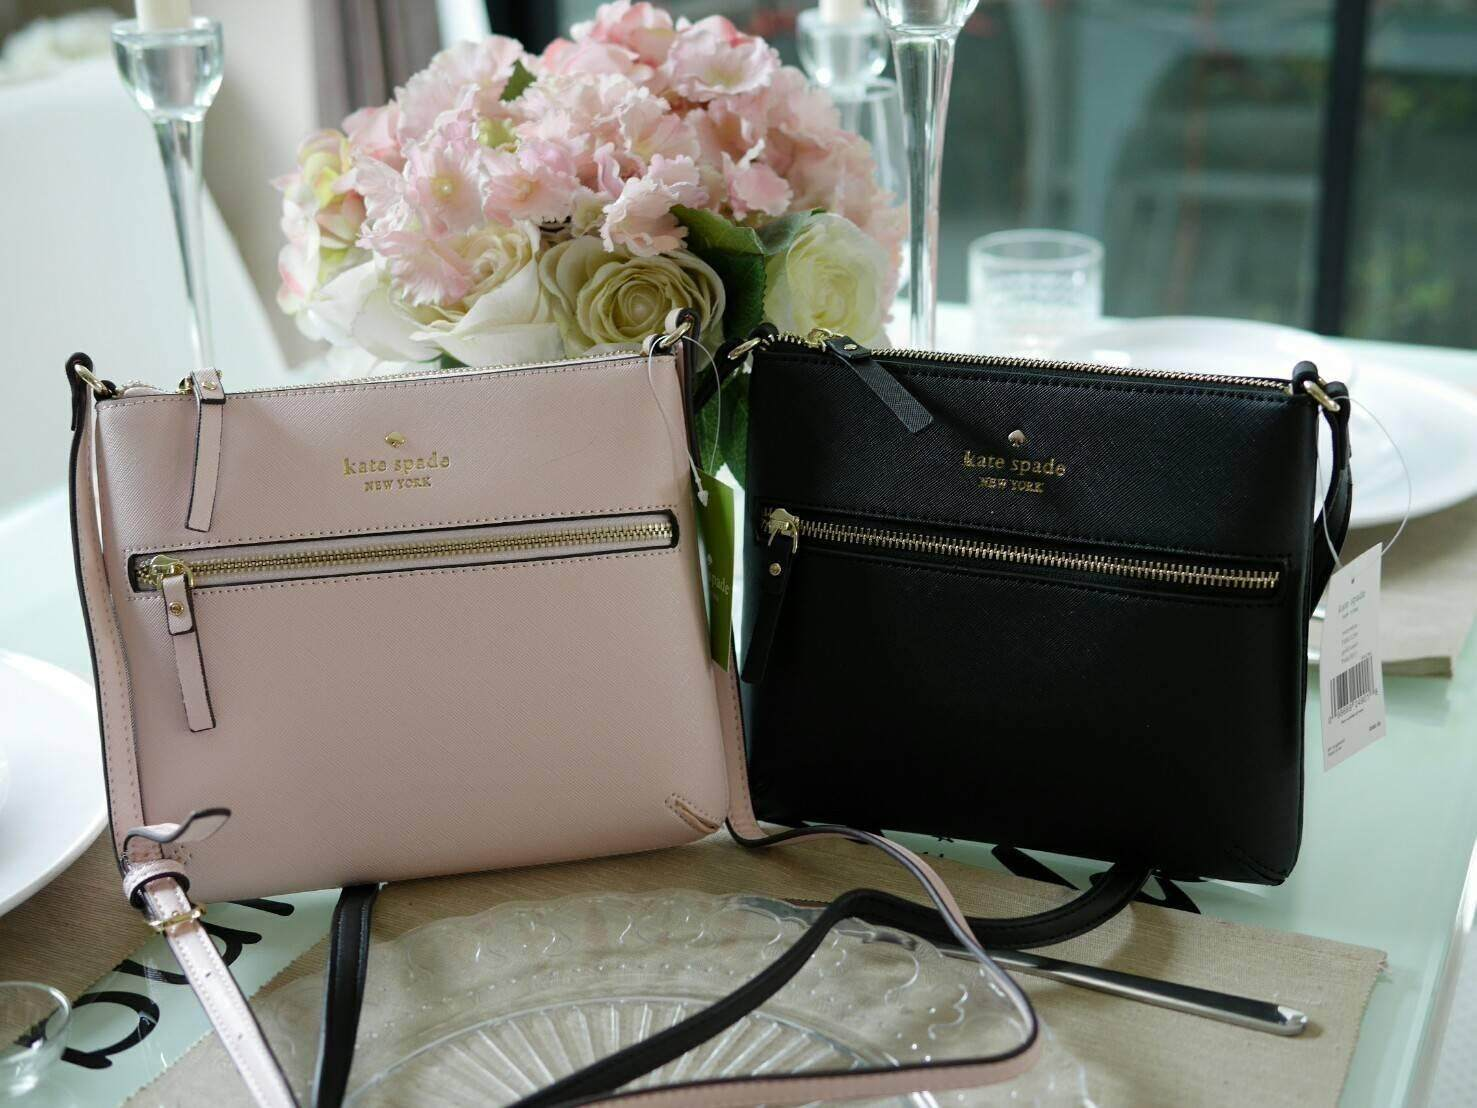 New Arrival Kate Spade New York Saffiano Crossbody Bag.